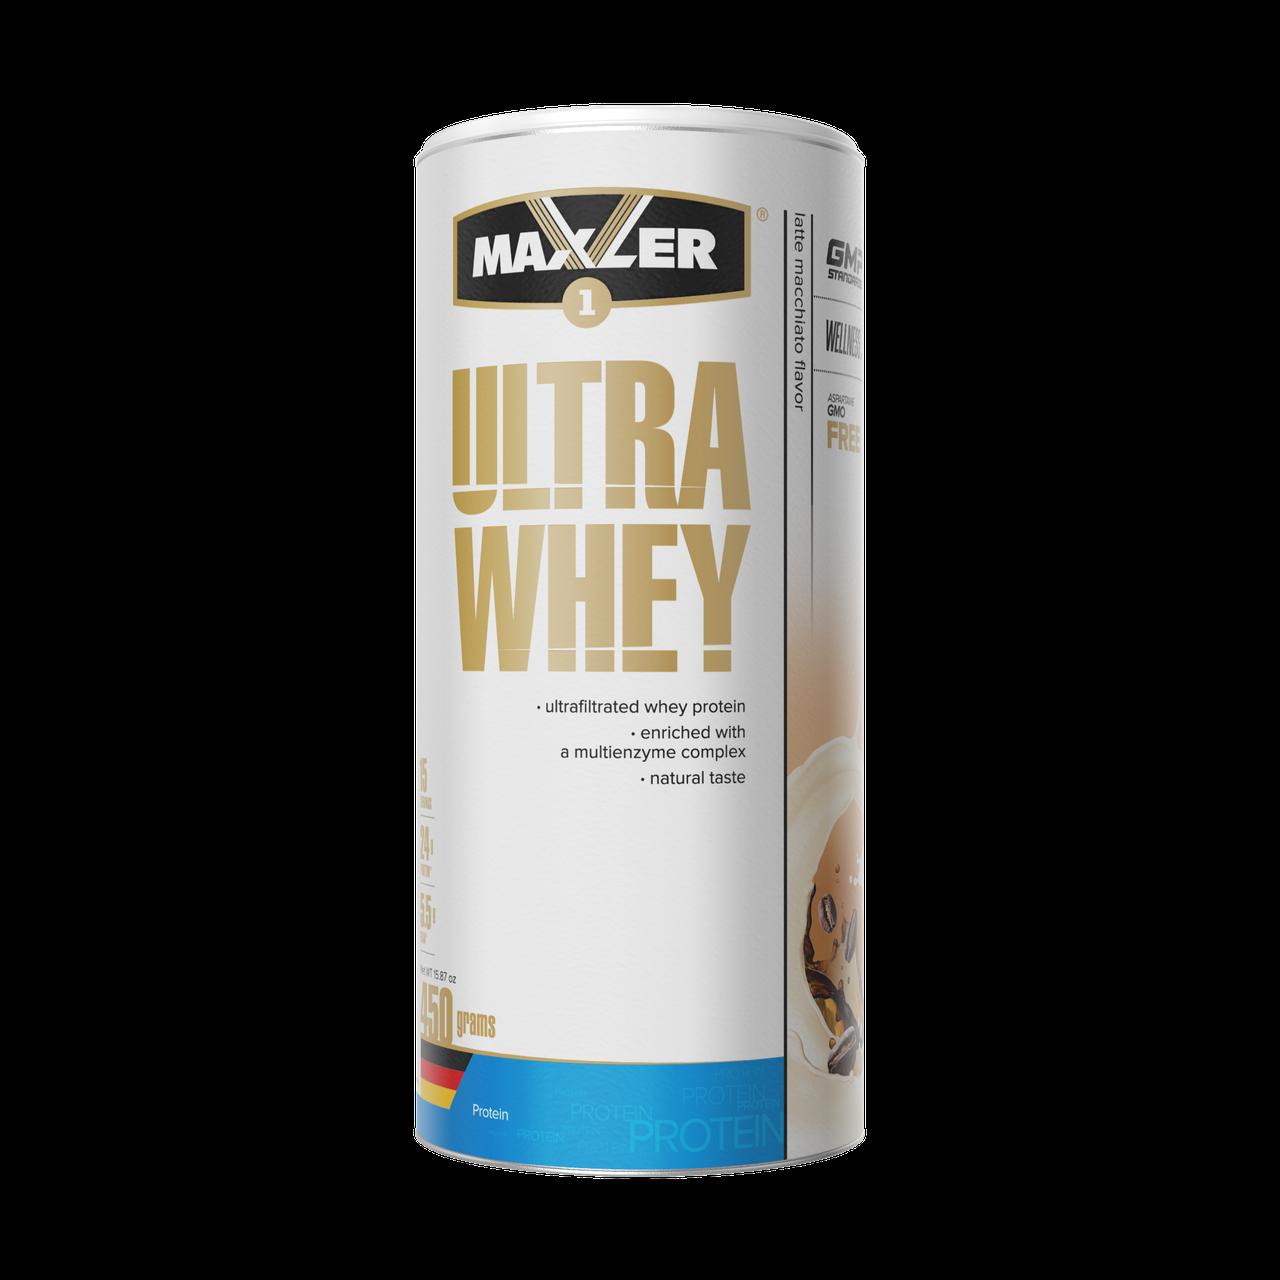 Max_Ultra Whey 450g - latte macchiato